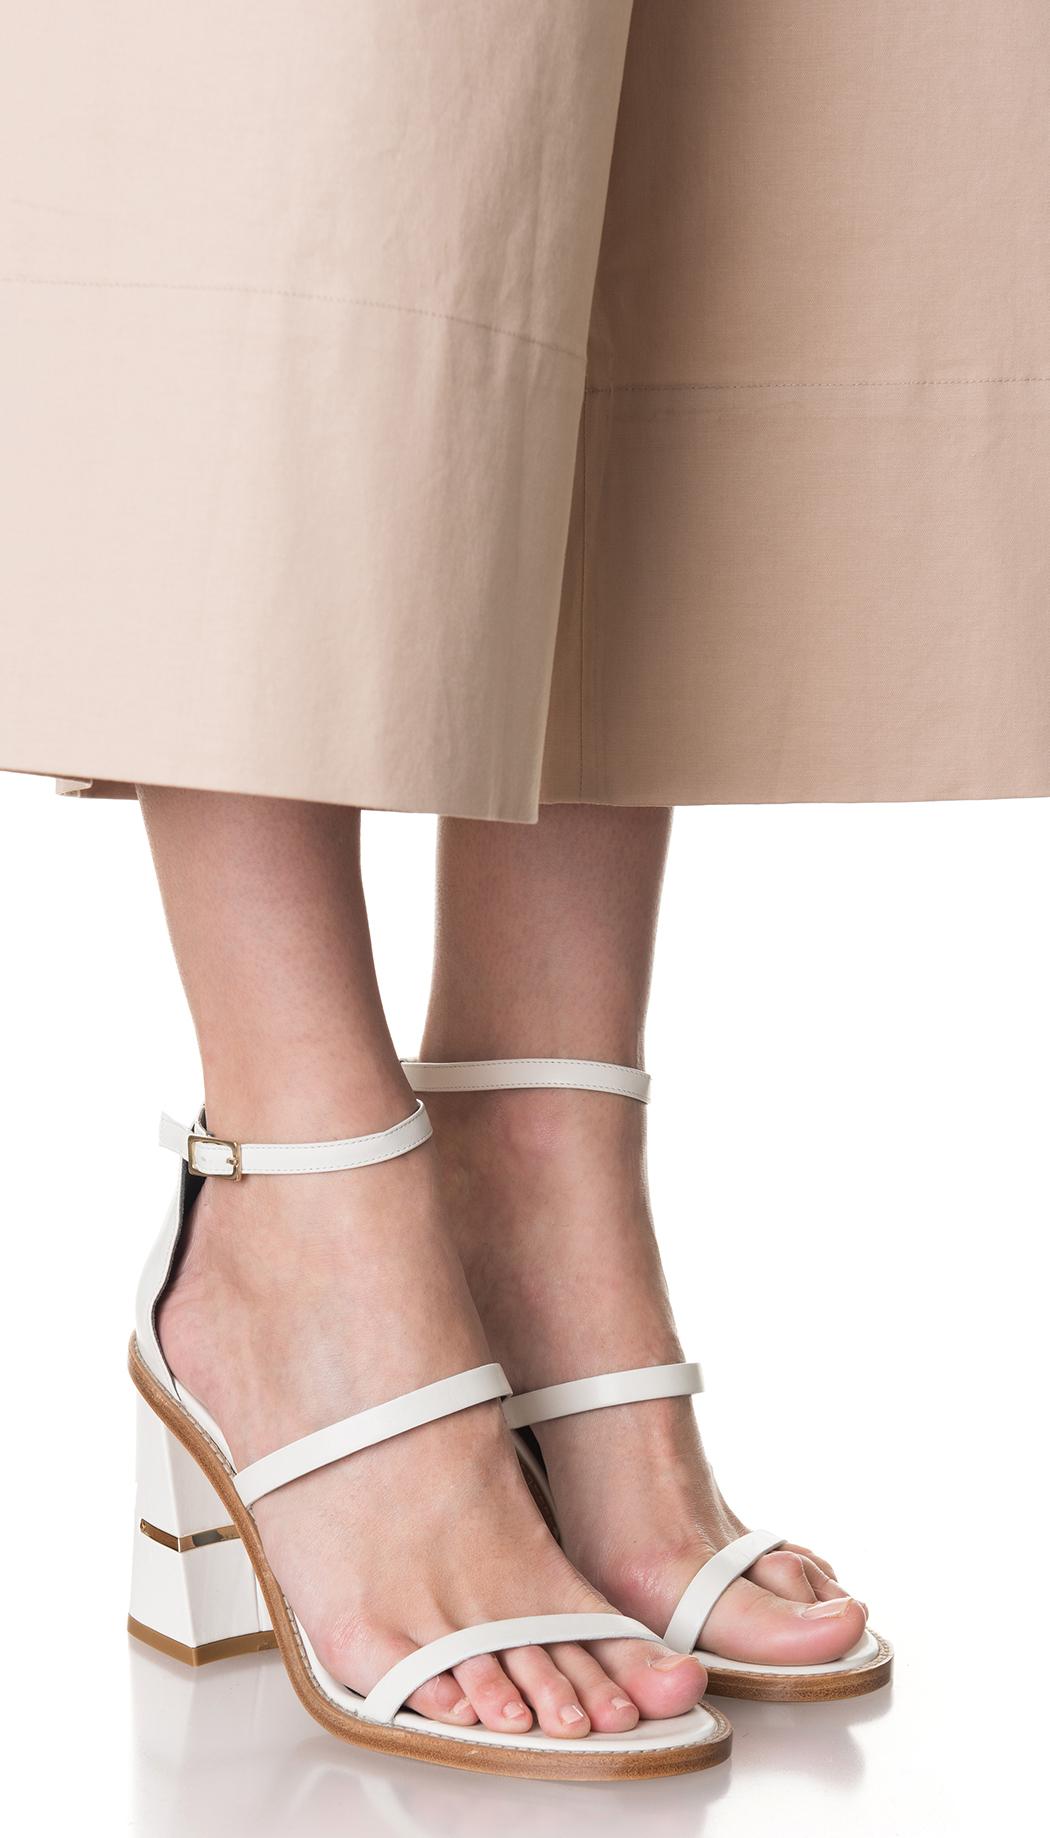 sale sneakernews Tibi Leather Platform Sandals ebay cheap price 9eBof